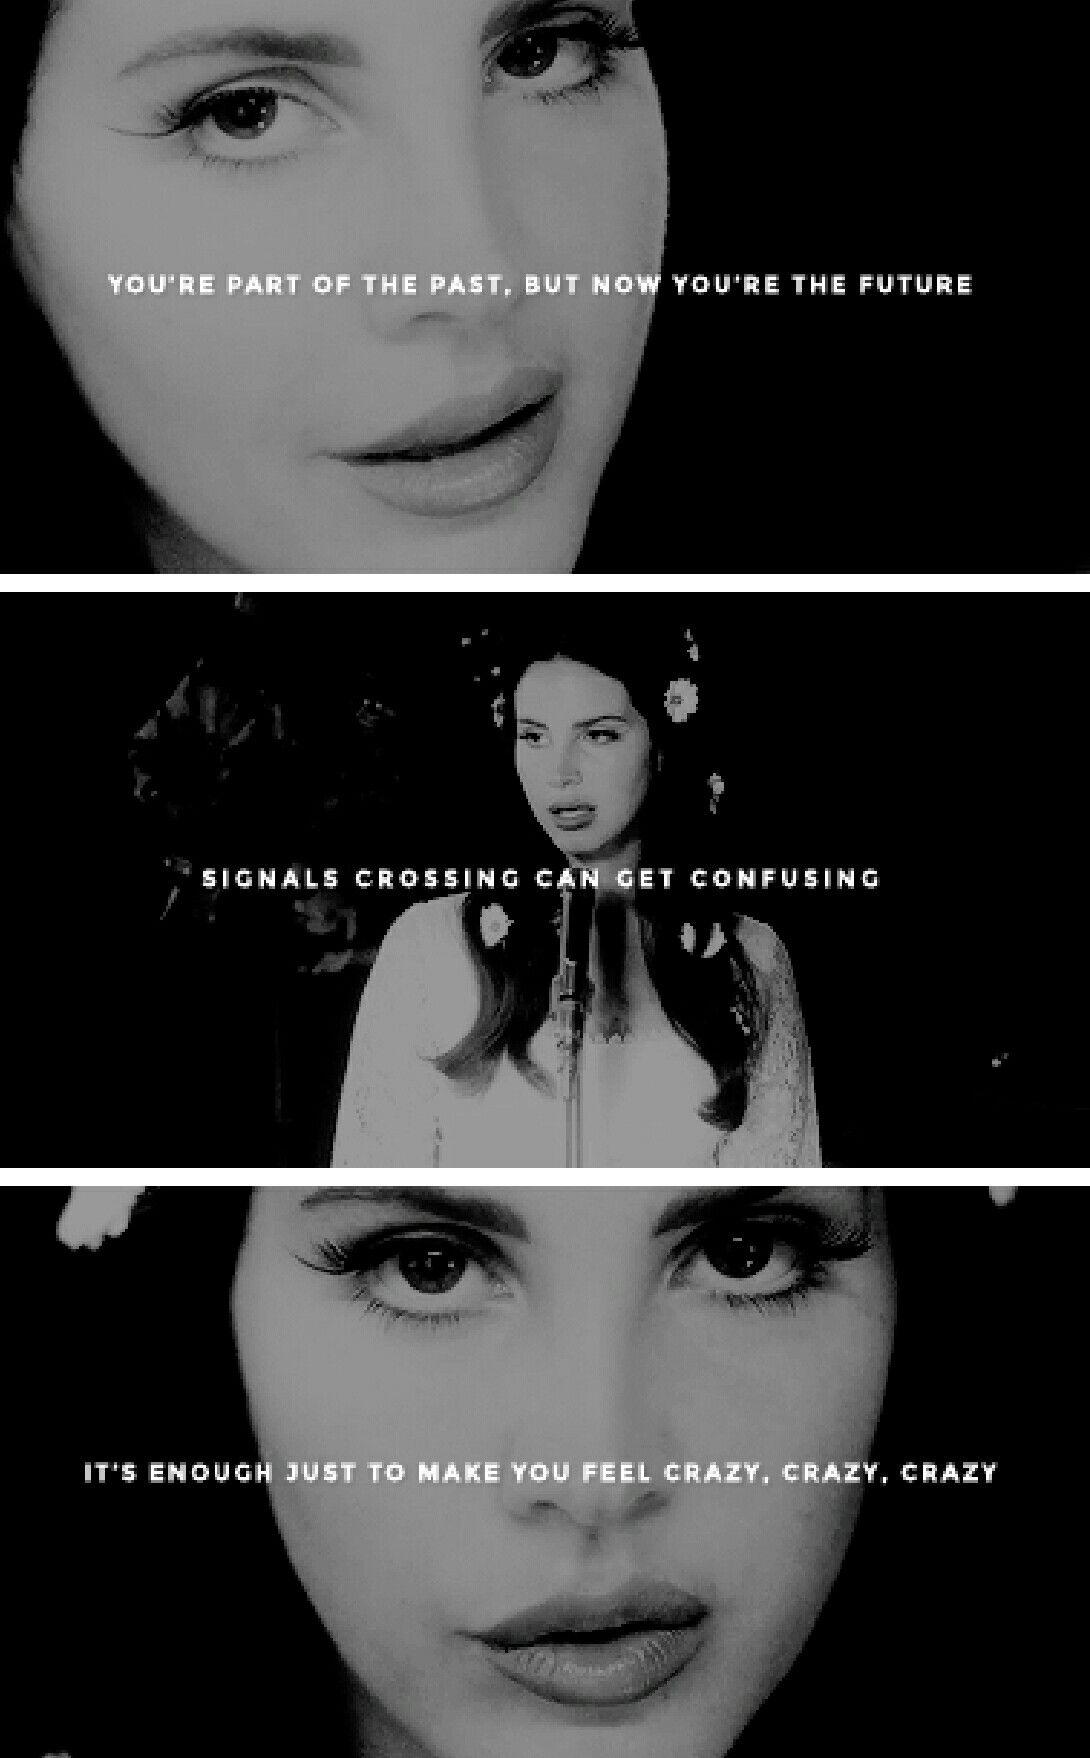 Lana Del Rey #LDR #Love | Lana Del Rey ~ LYRICS | SONGS ...